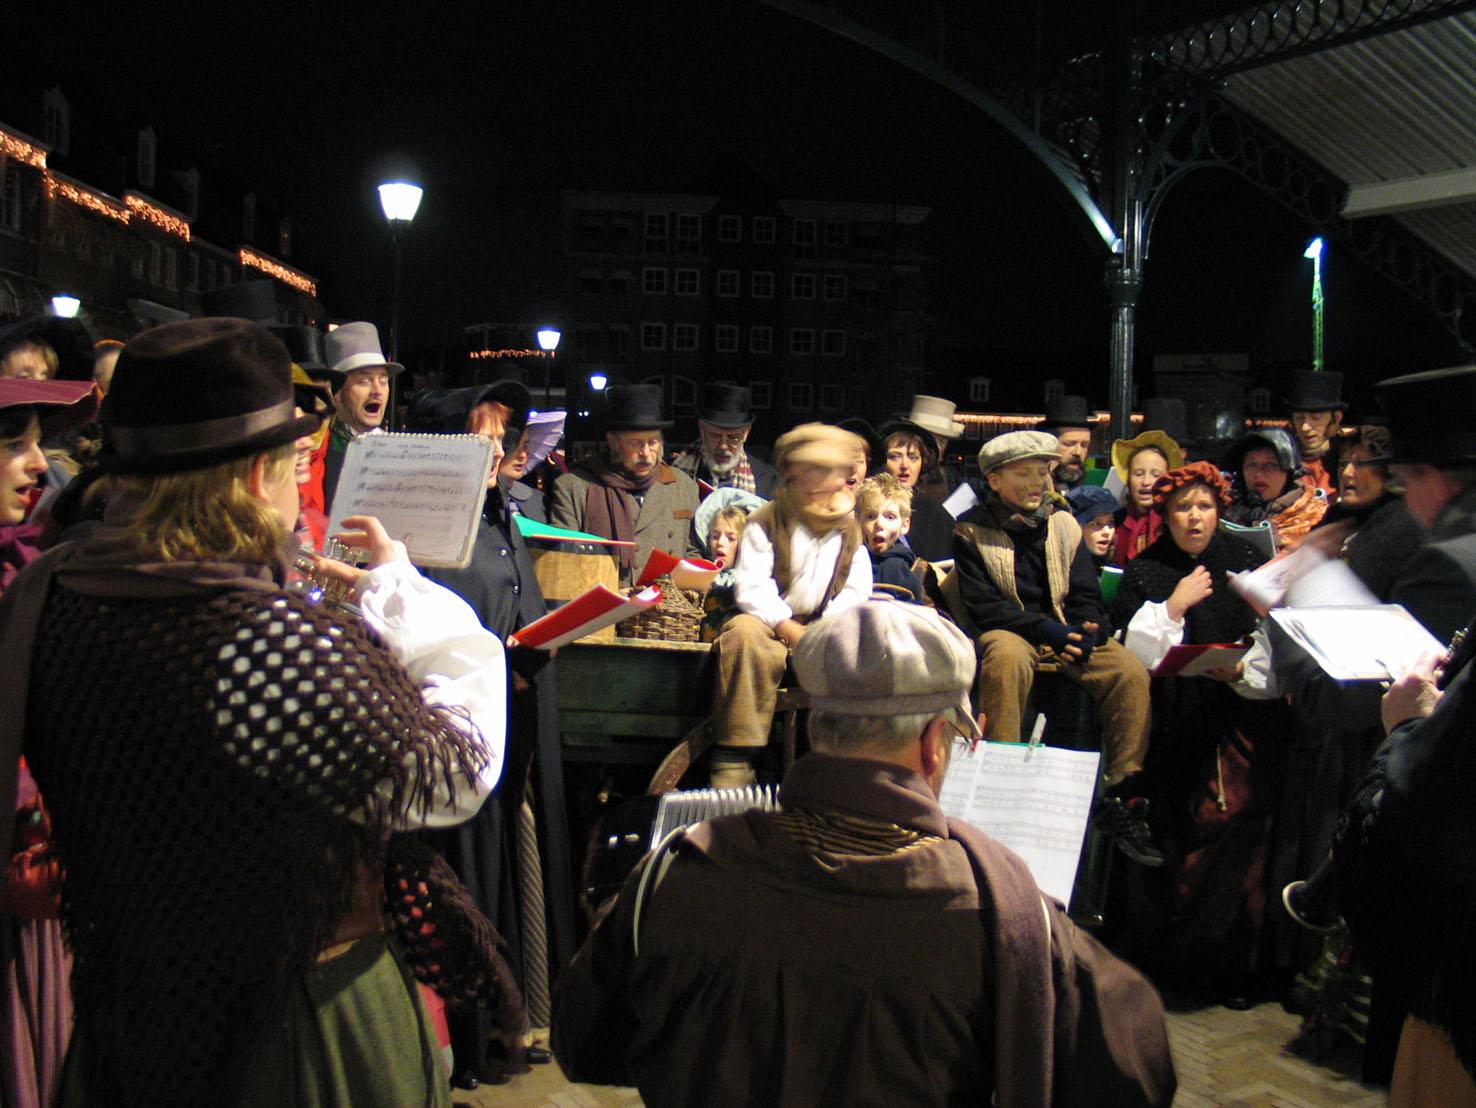 135 - Kerstmarkt Helmond 2003.jpg